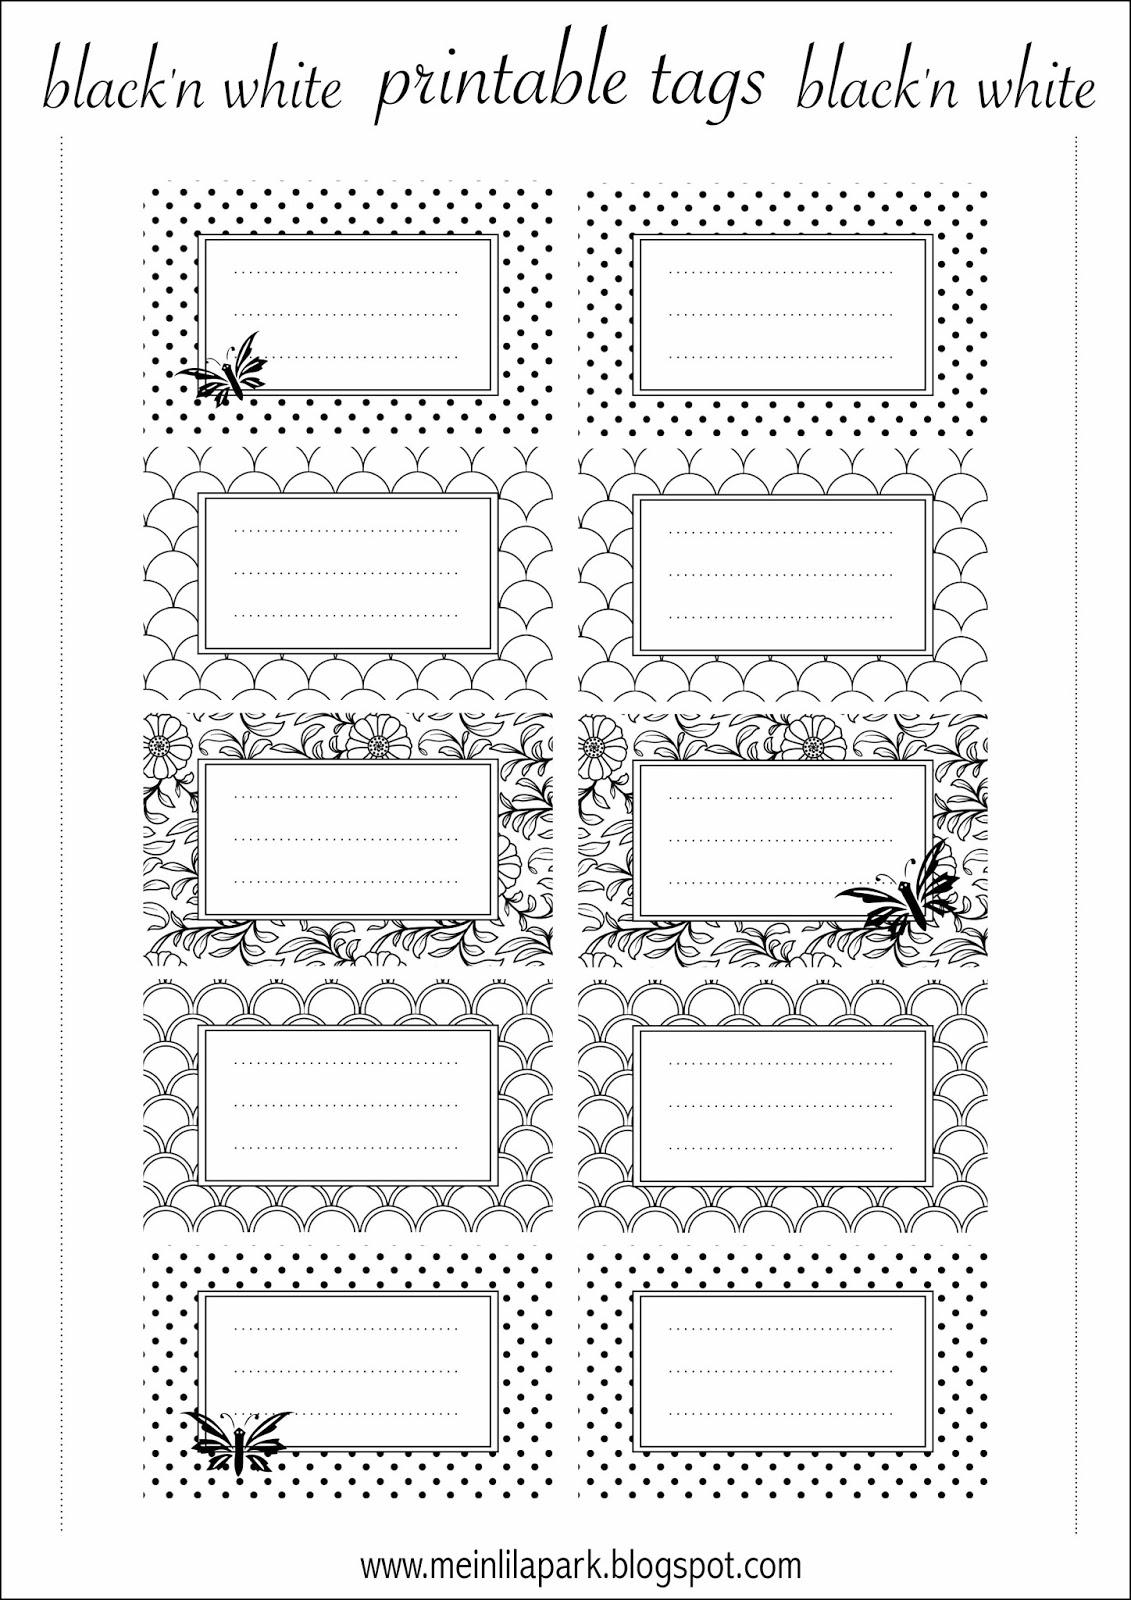 Free printable tags black and white - ausdruckbare ...